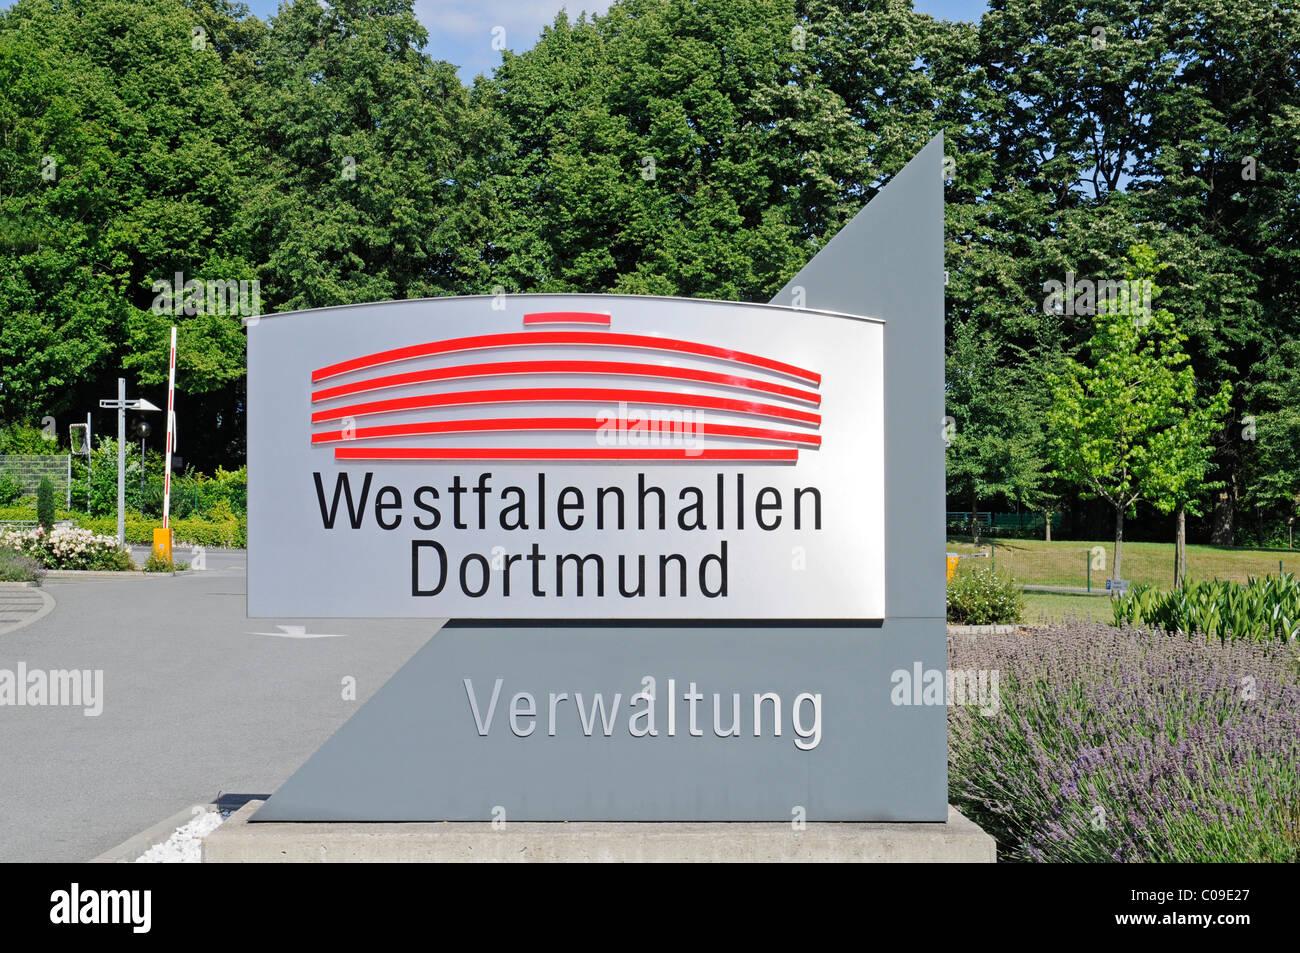 Westfalenhallen venue, logo, administrative buildings, Dortmund, Ruhrgebiet region, North Rhine-Westphalia, Germany, - Stock Image